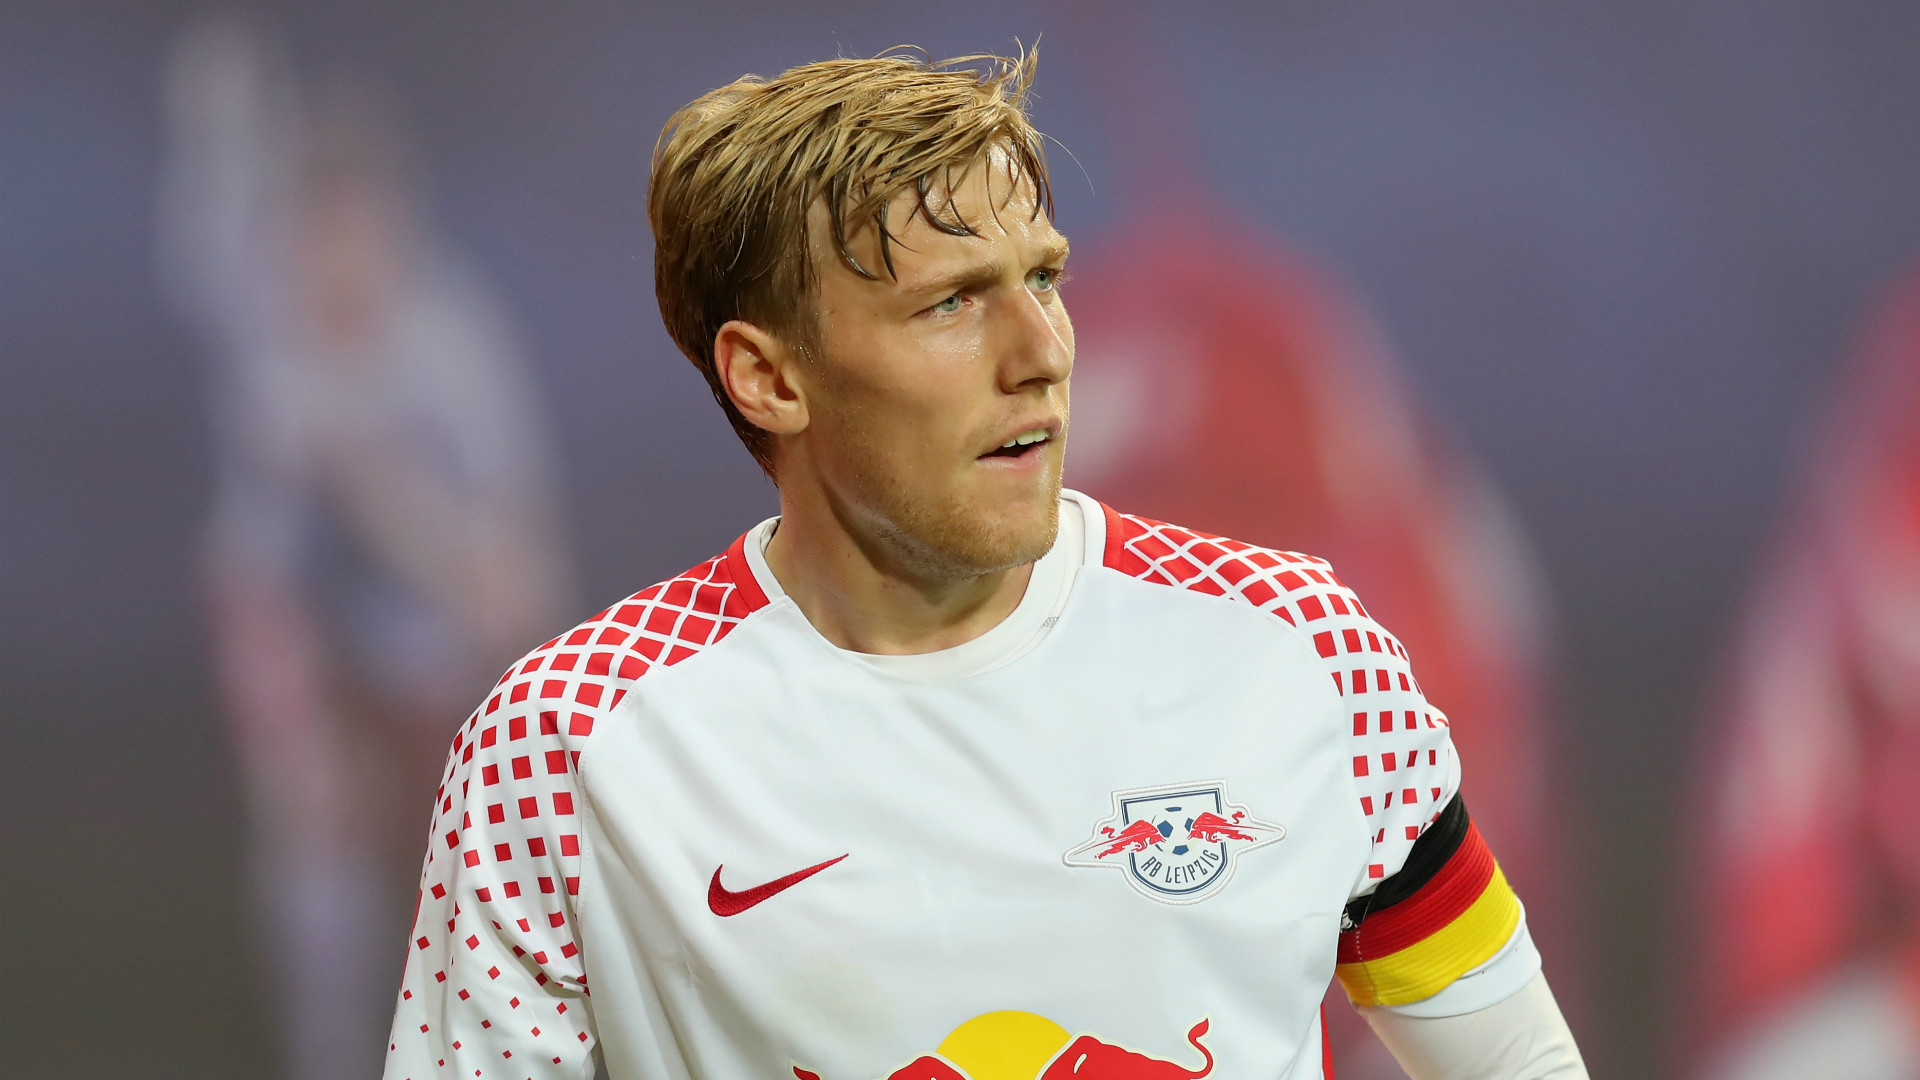 لایپزیش-بوندسلیگا-سوئد-RB Leipzig-Bundesliga-Sweden